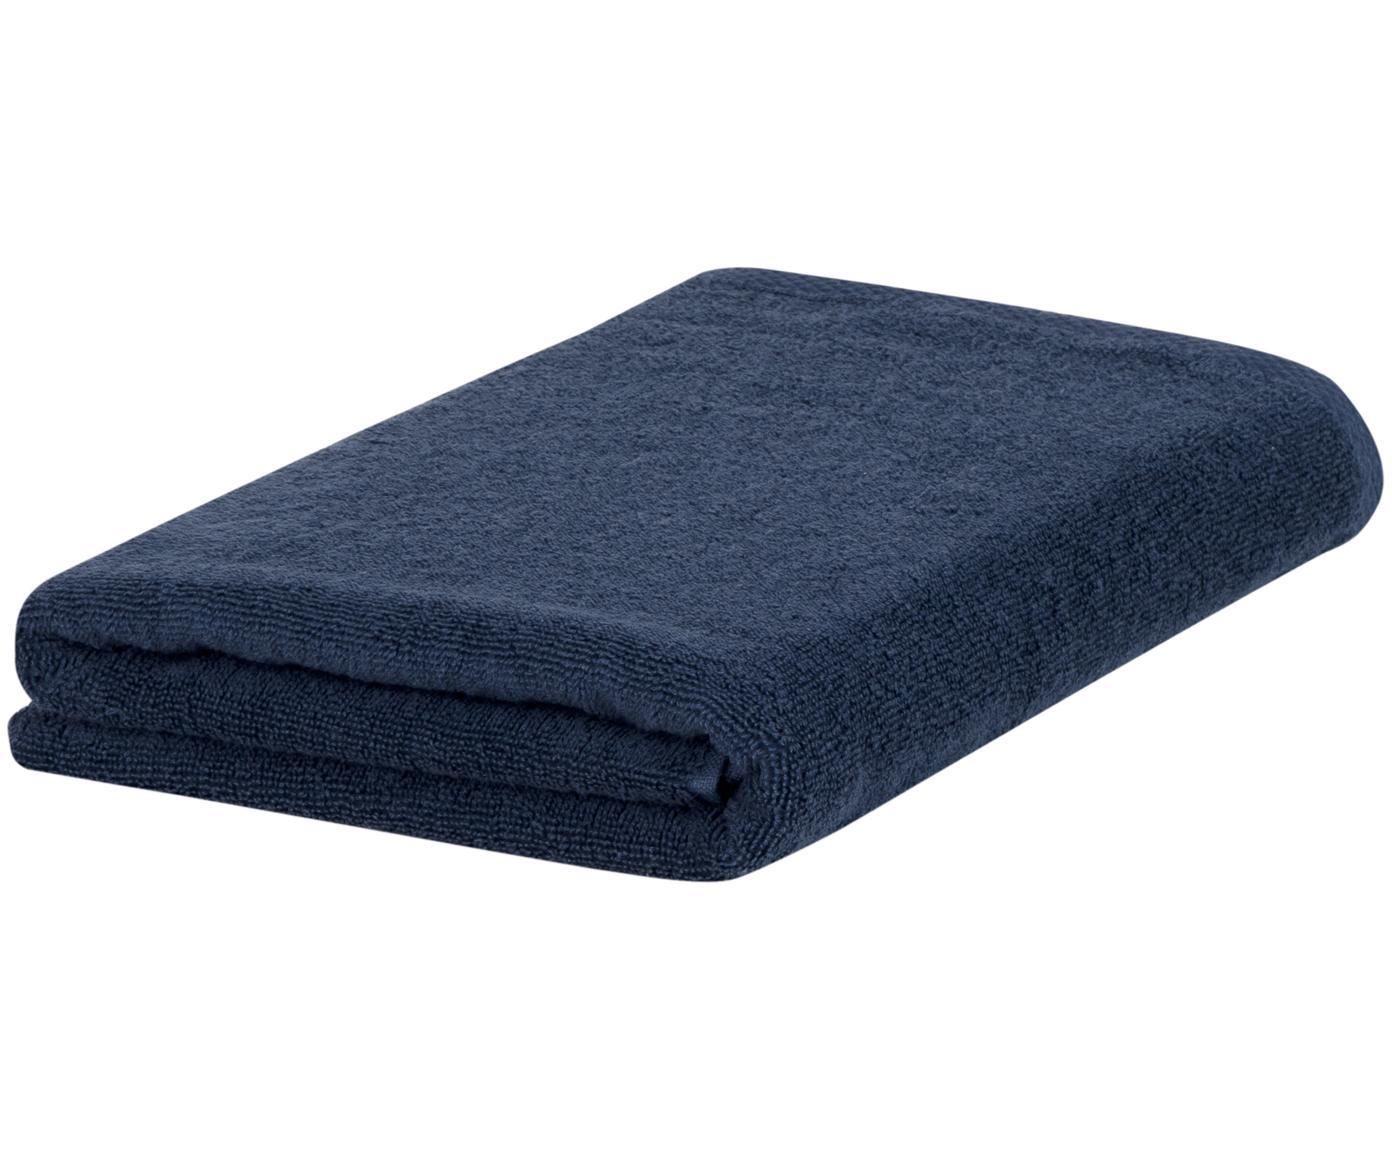 Asciugamano in tinta unita Comfort, Blu scuro, Asciugamano per ospiti